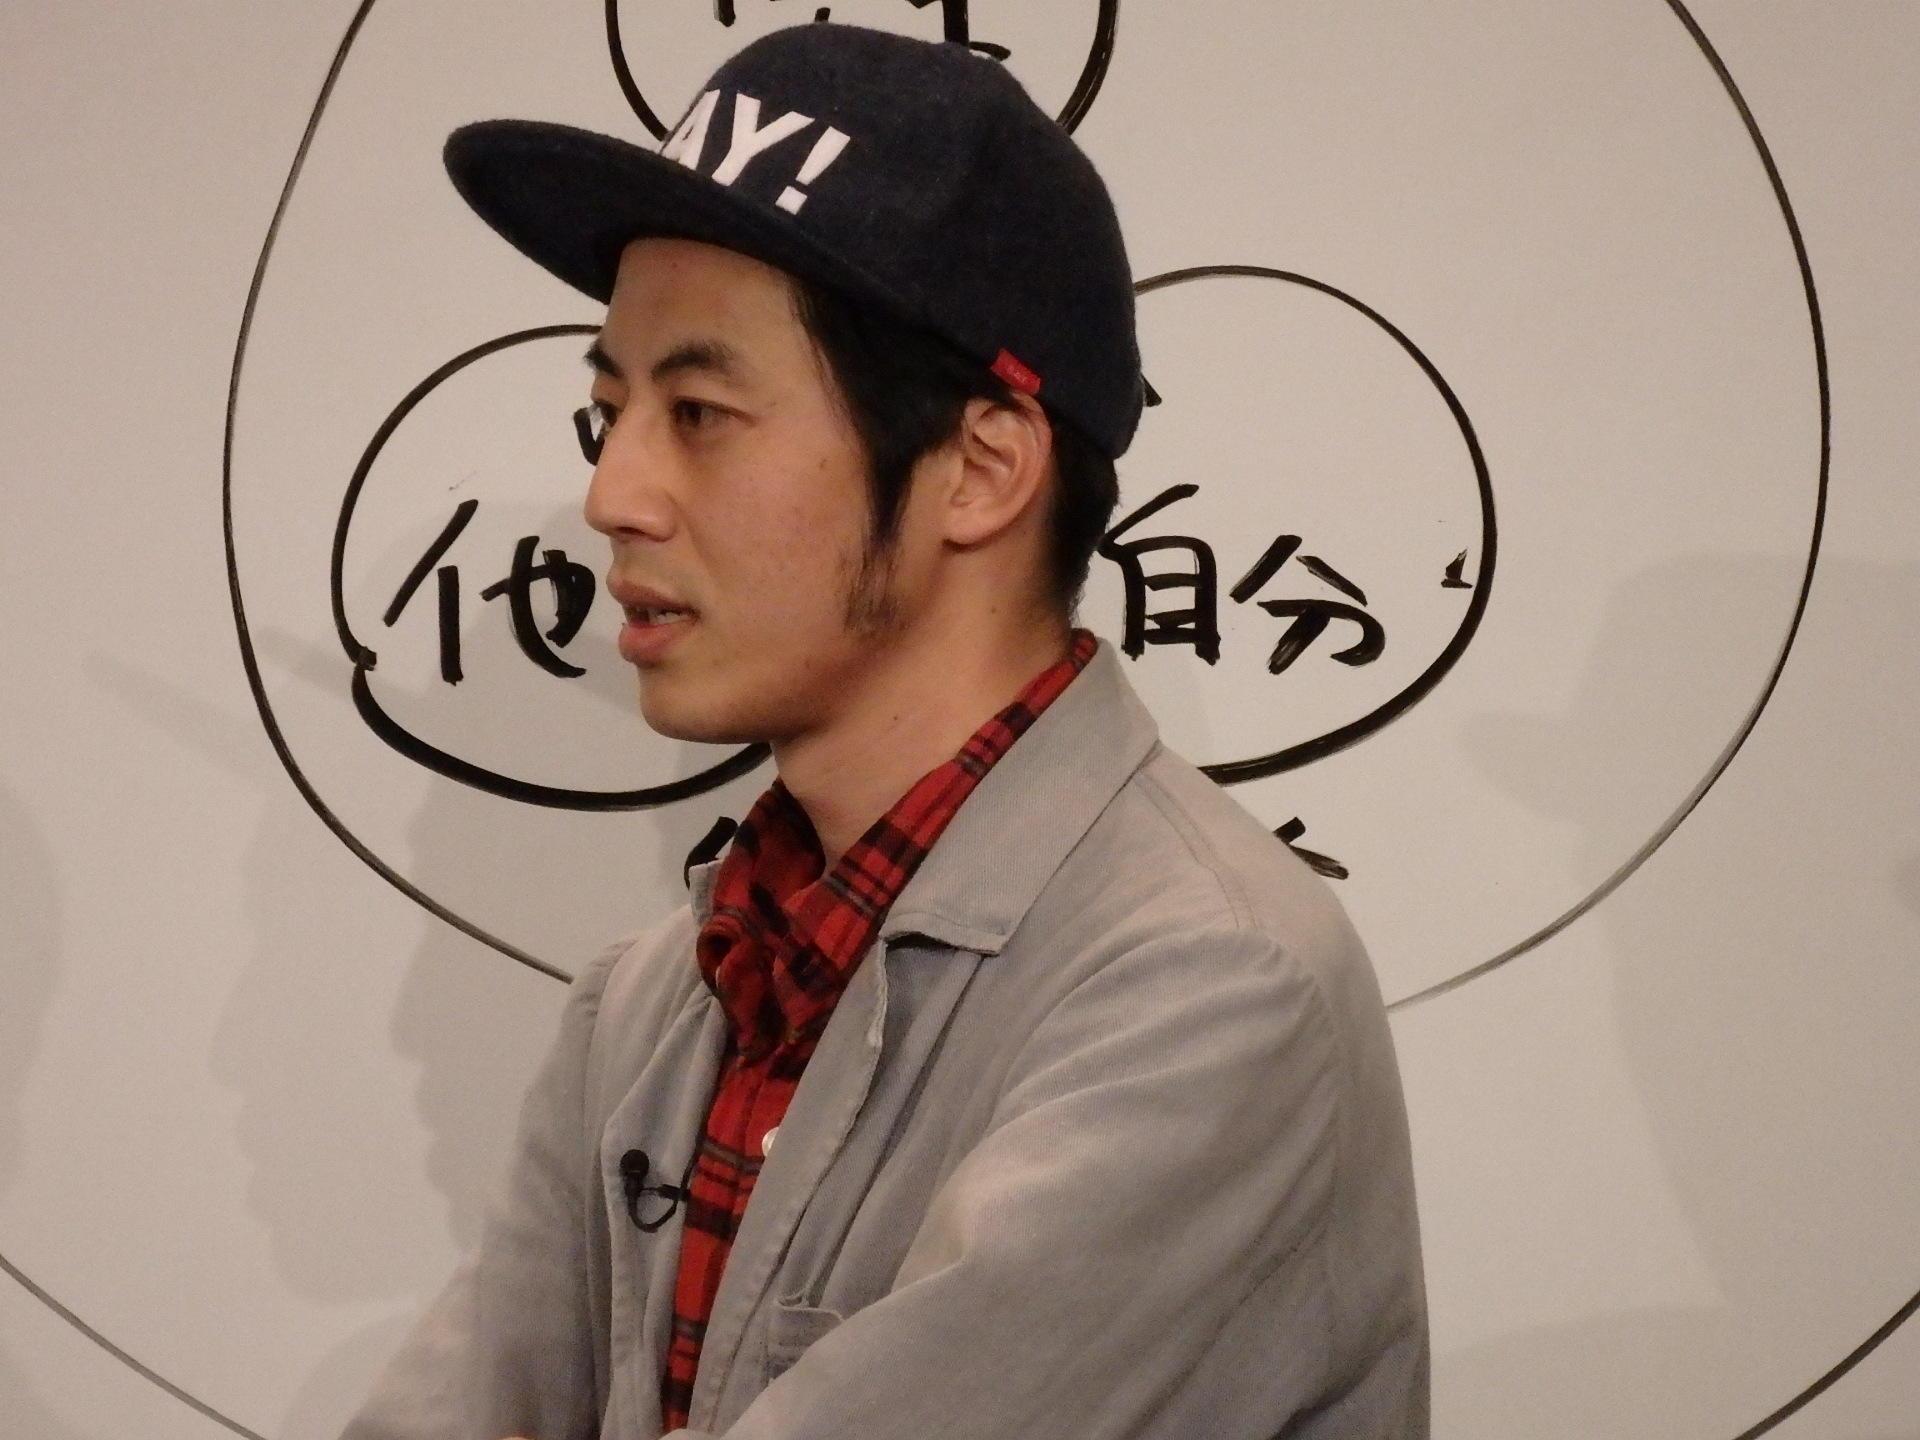 http://news.yoshimoto.co.jp/20160116181703-52fa4d560a6aff990e2375dced0b511fc092780a.jpg